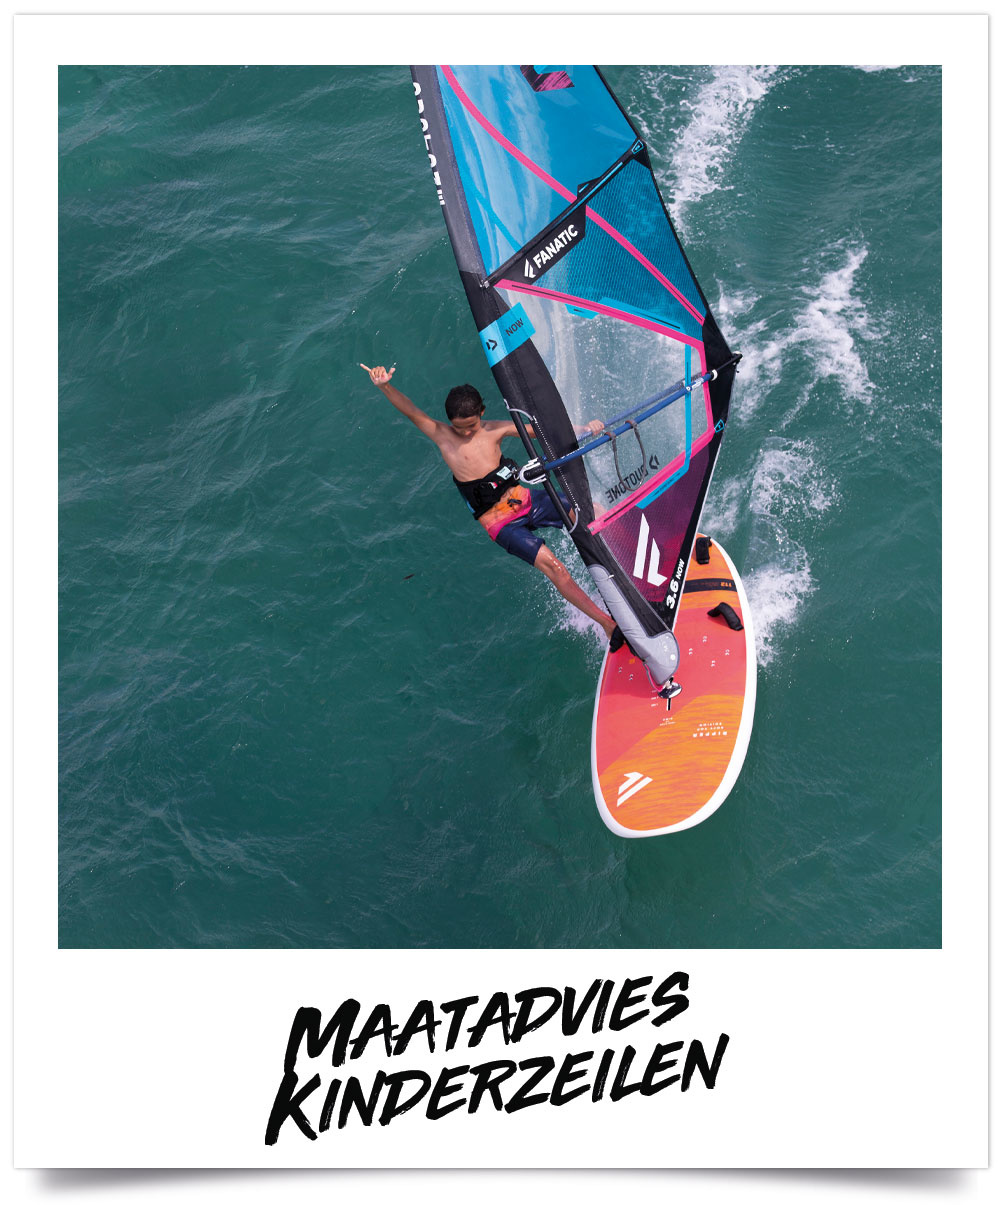 Maattabel Kinder Windsurfzeilen